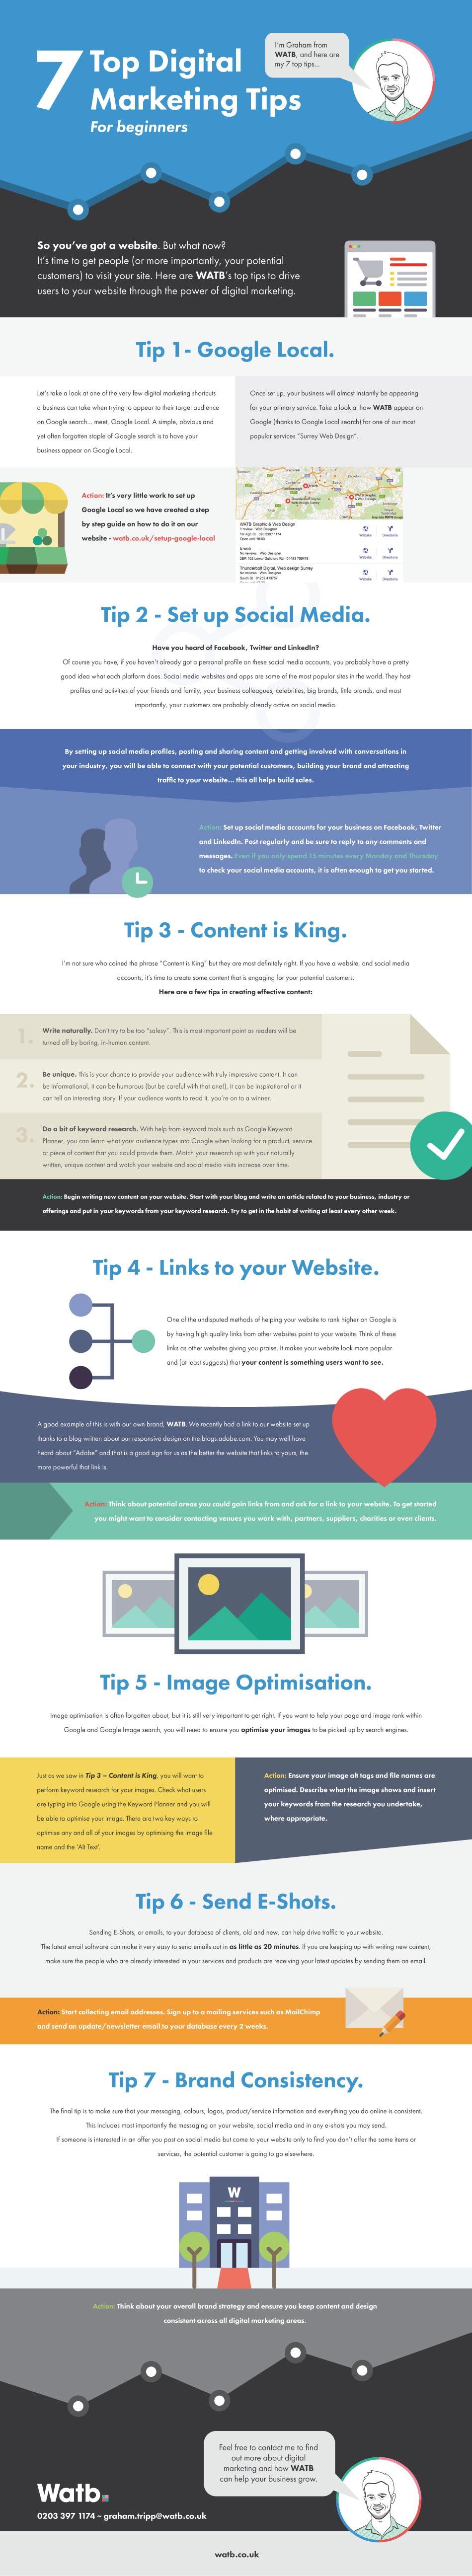 7 Top Digital Marketing Tips - #infographic